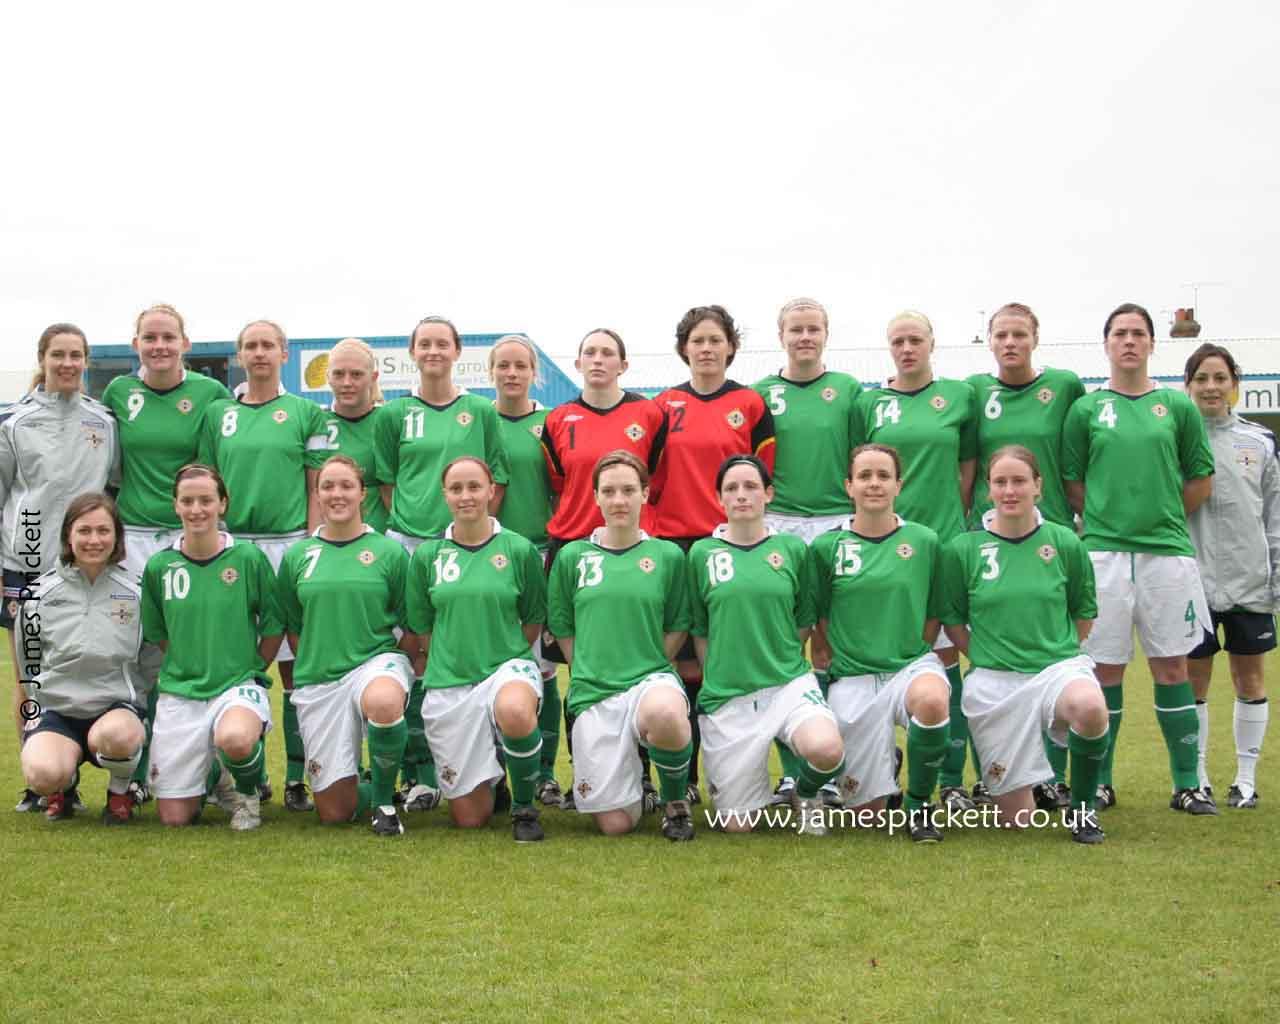 45 Northern Ireland Soccer Wallpapers   Download at WallpaperBro 1280x1024